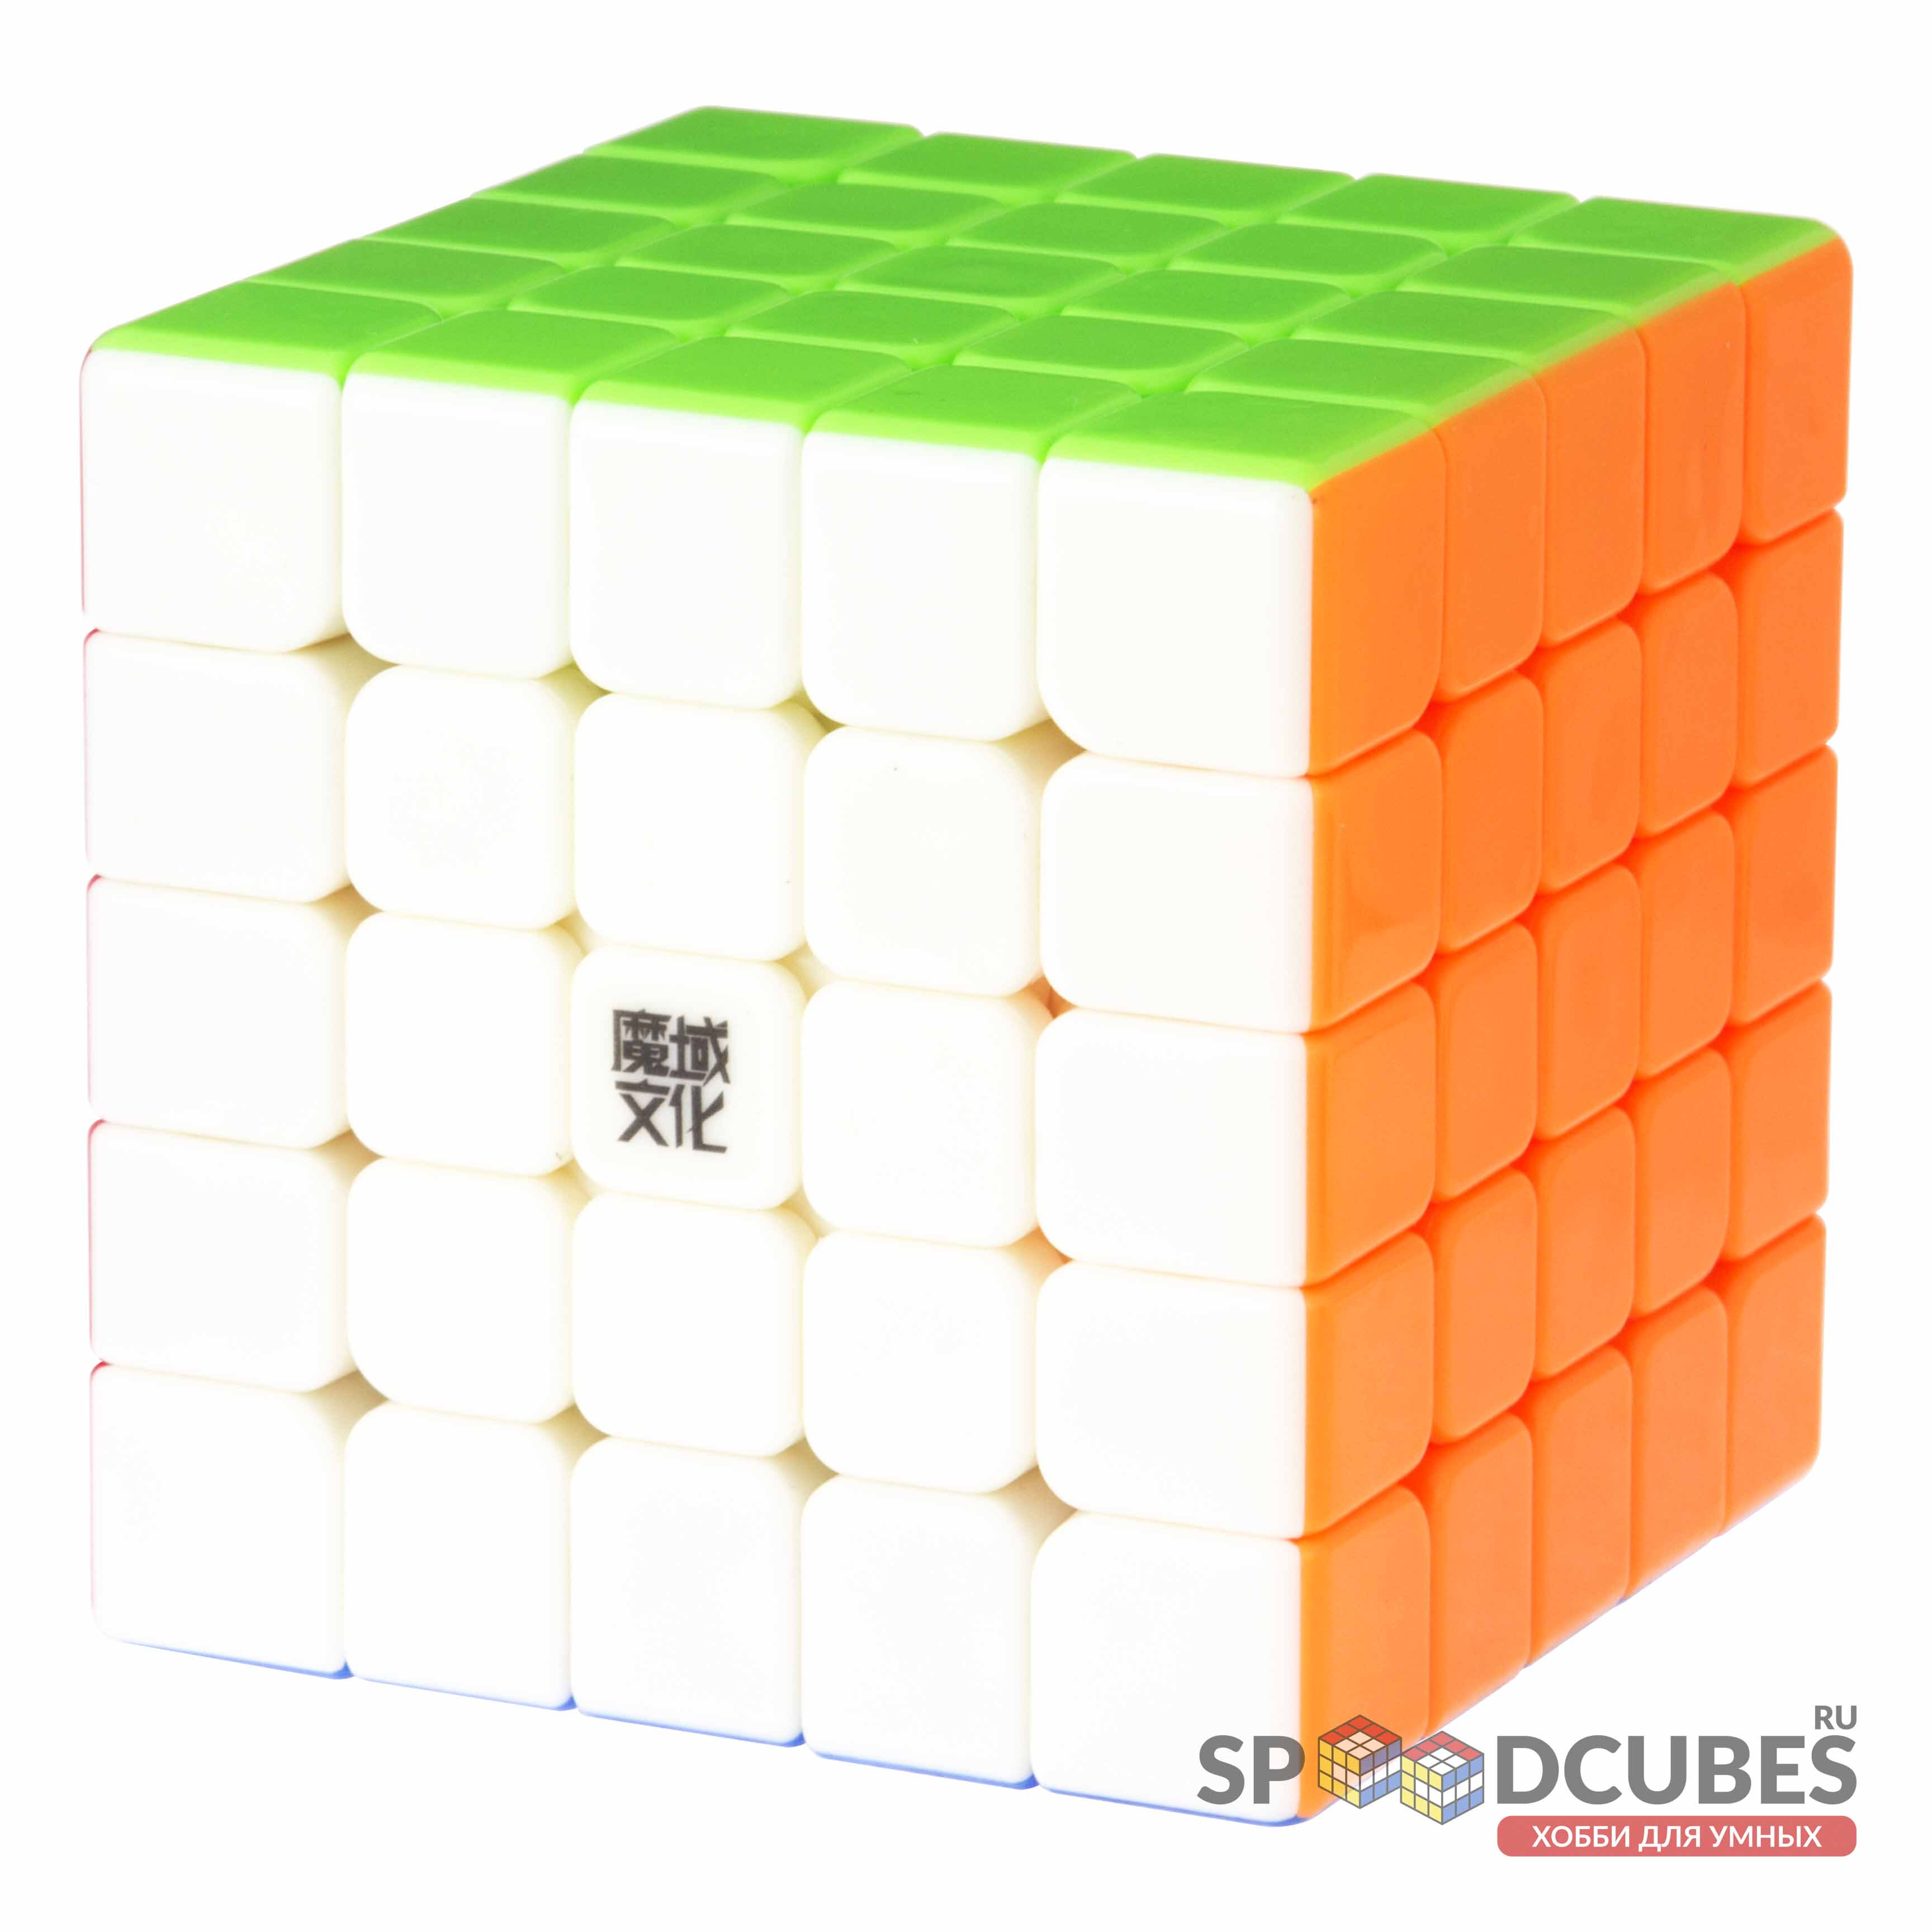 MoYu 5x5x5 Aochuang GTS M